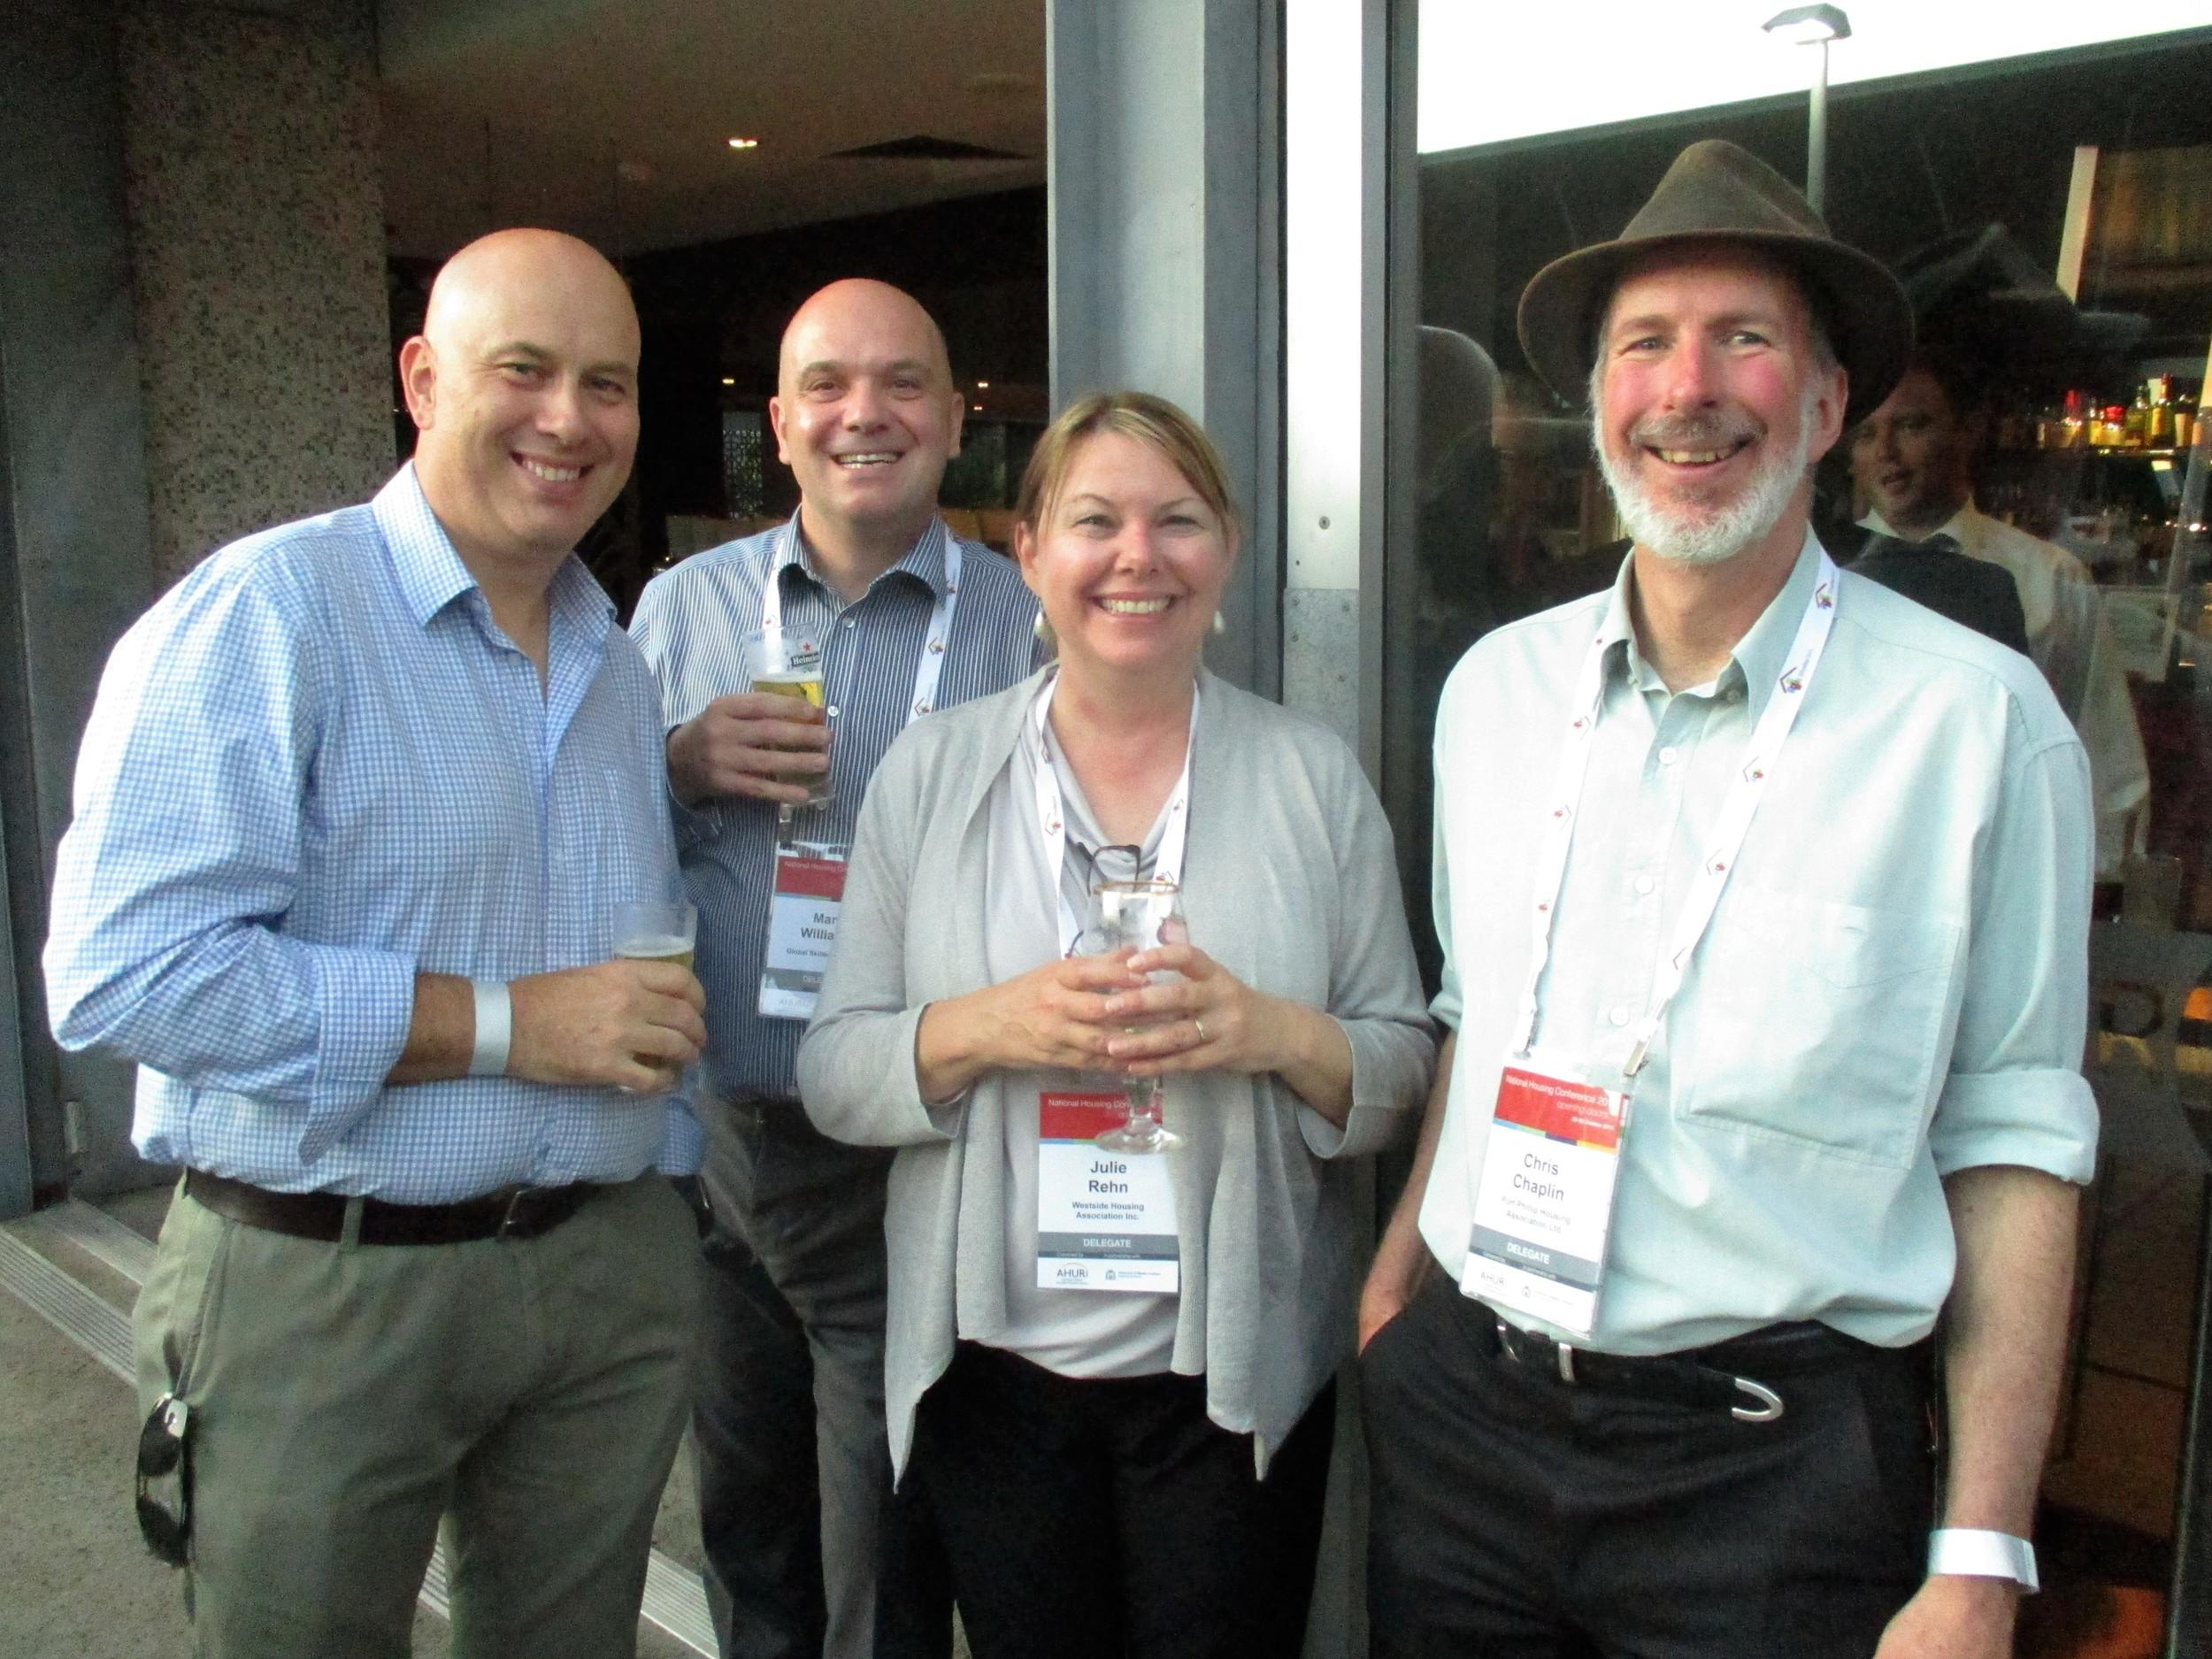 2015-10-29  Perth conference 15.JPG